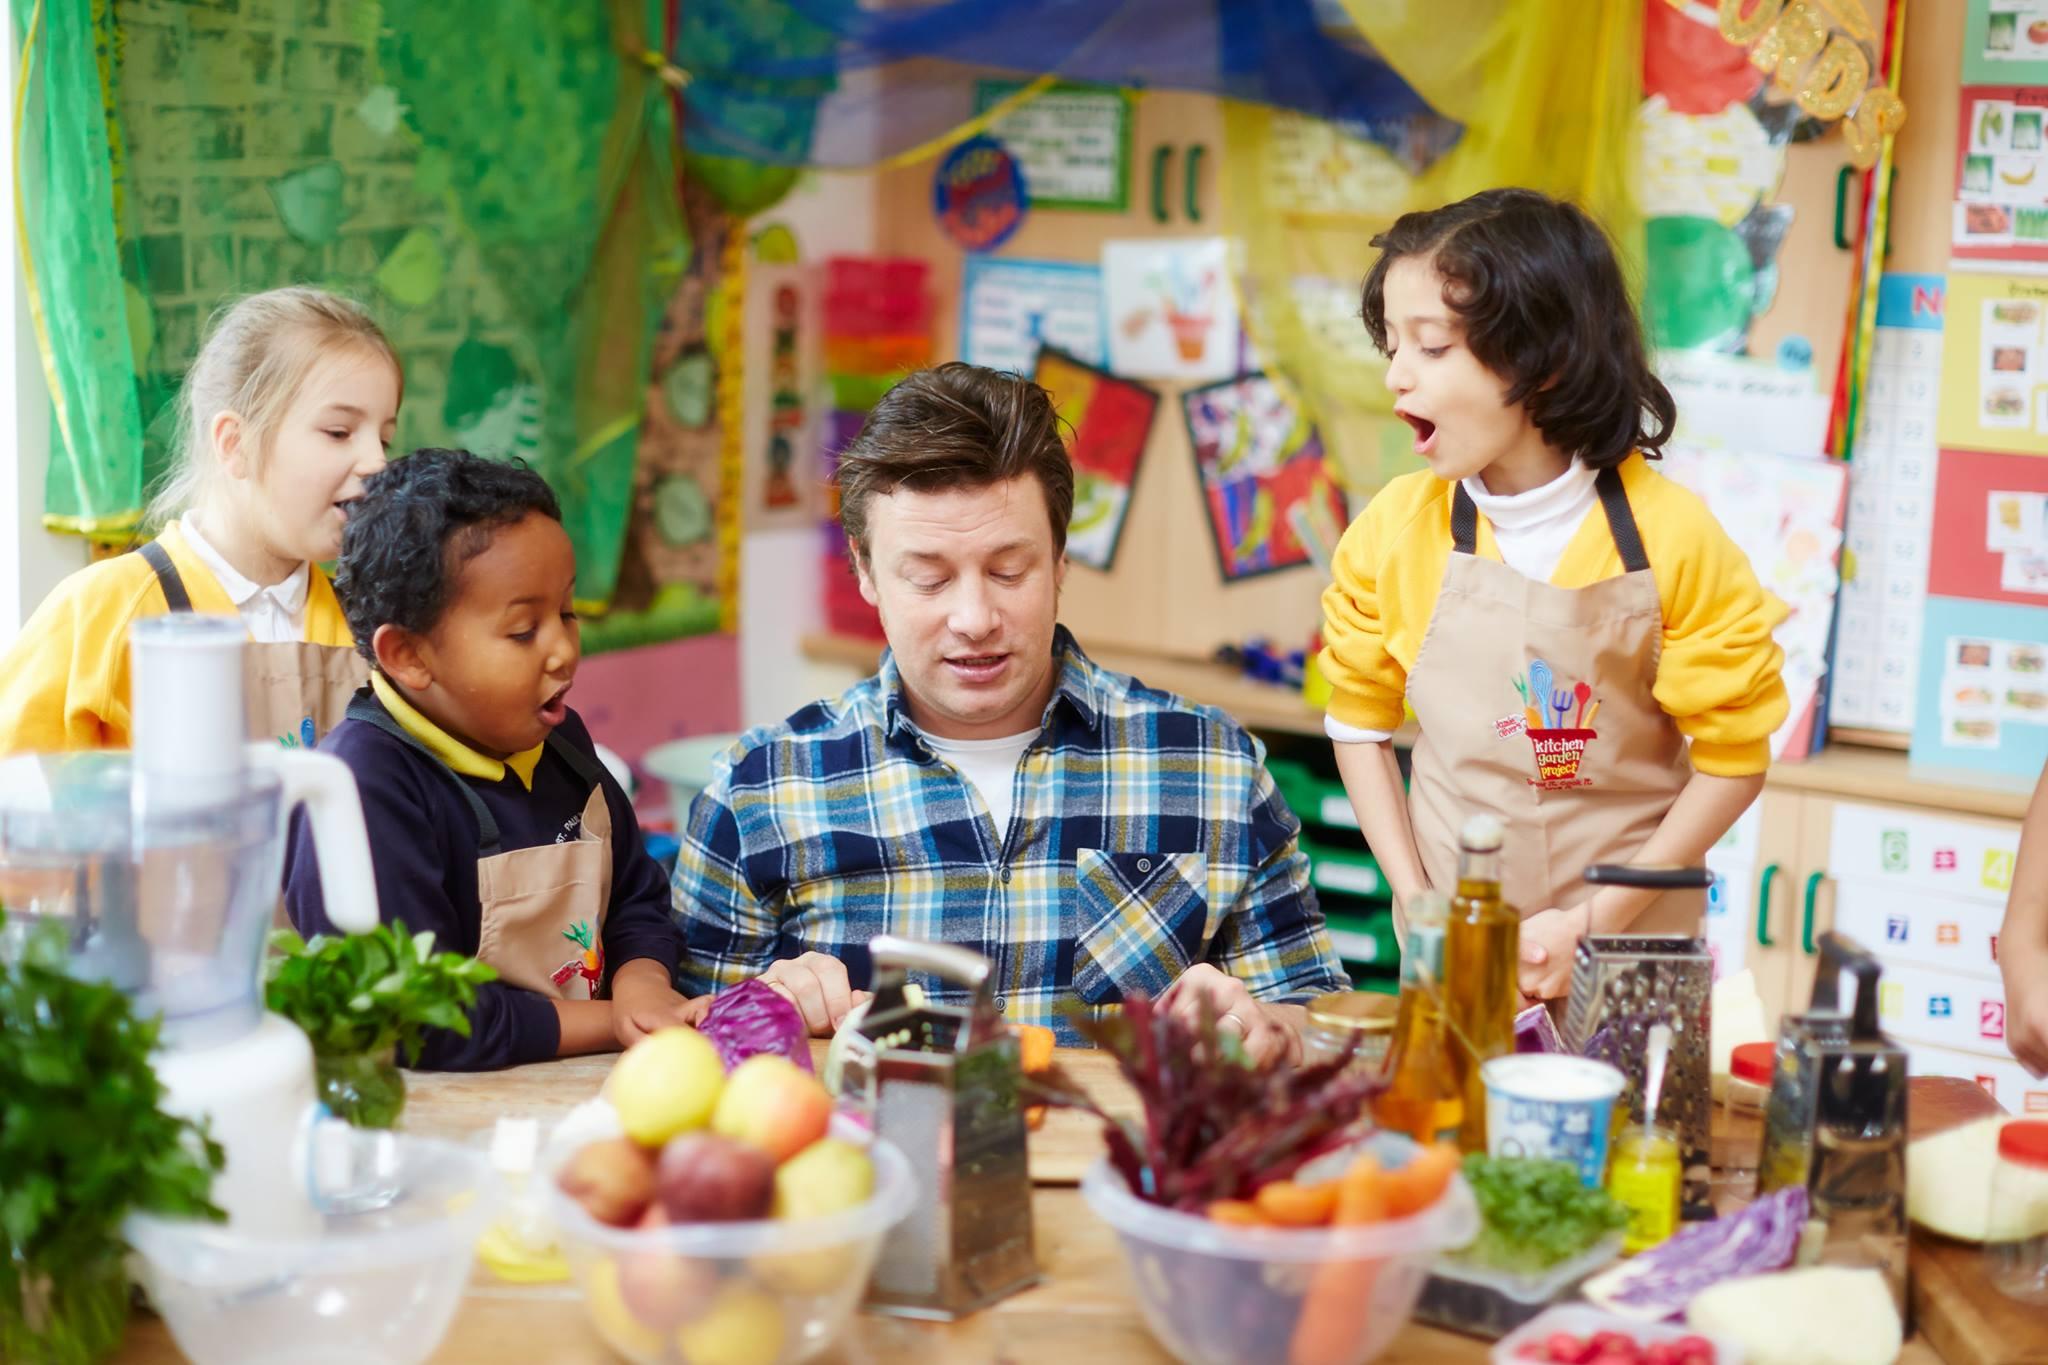 Baby-Faced Jamie Oliver Seeks Investors, Eyes Expansion